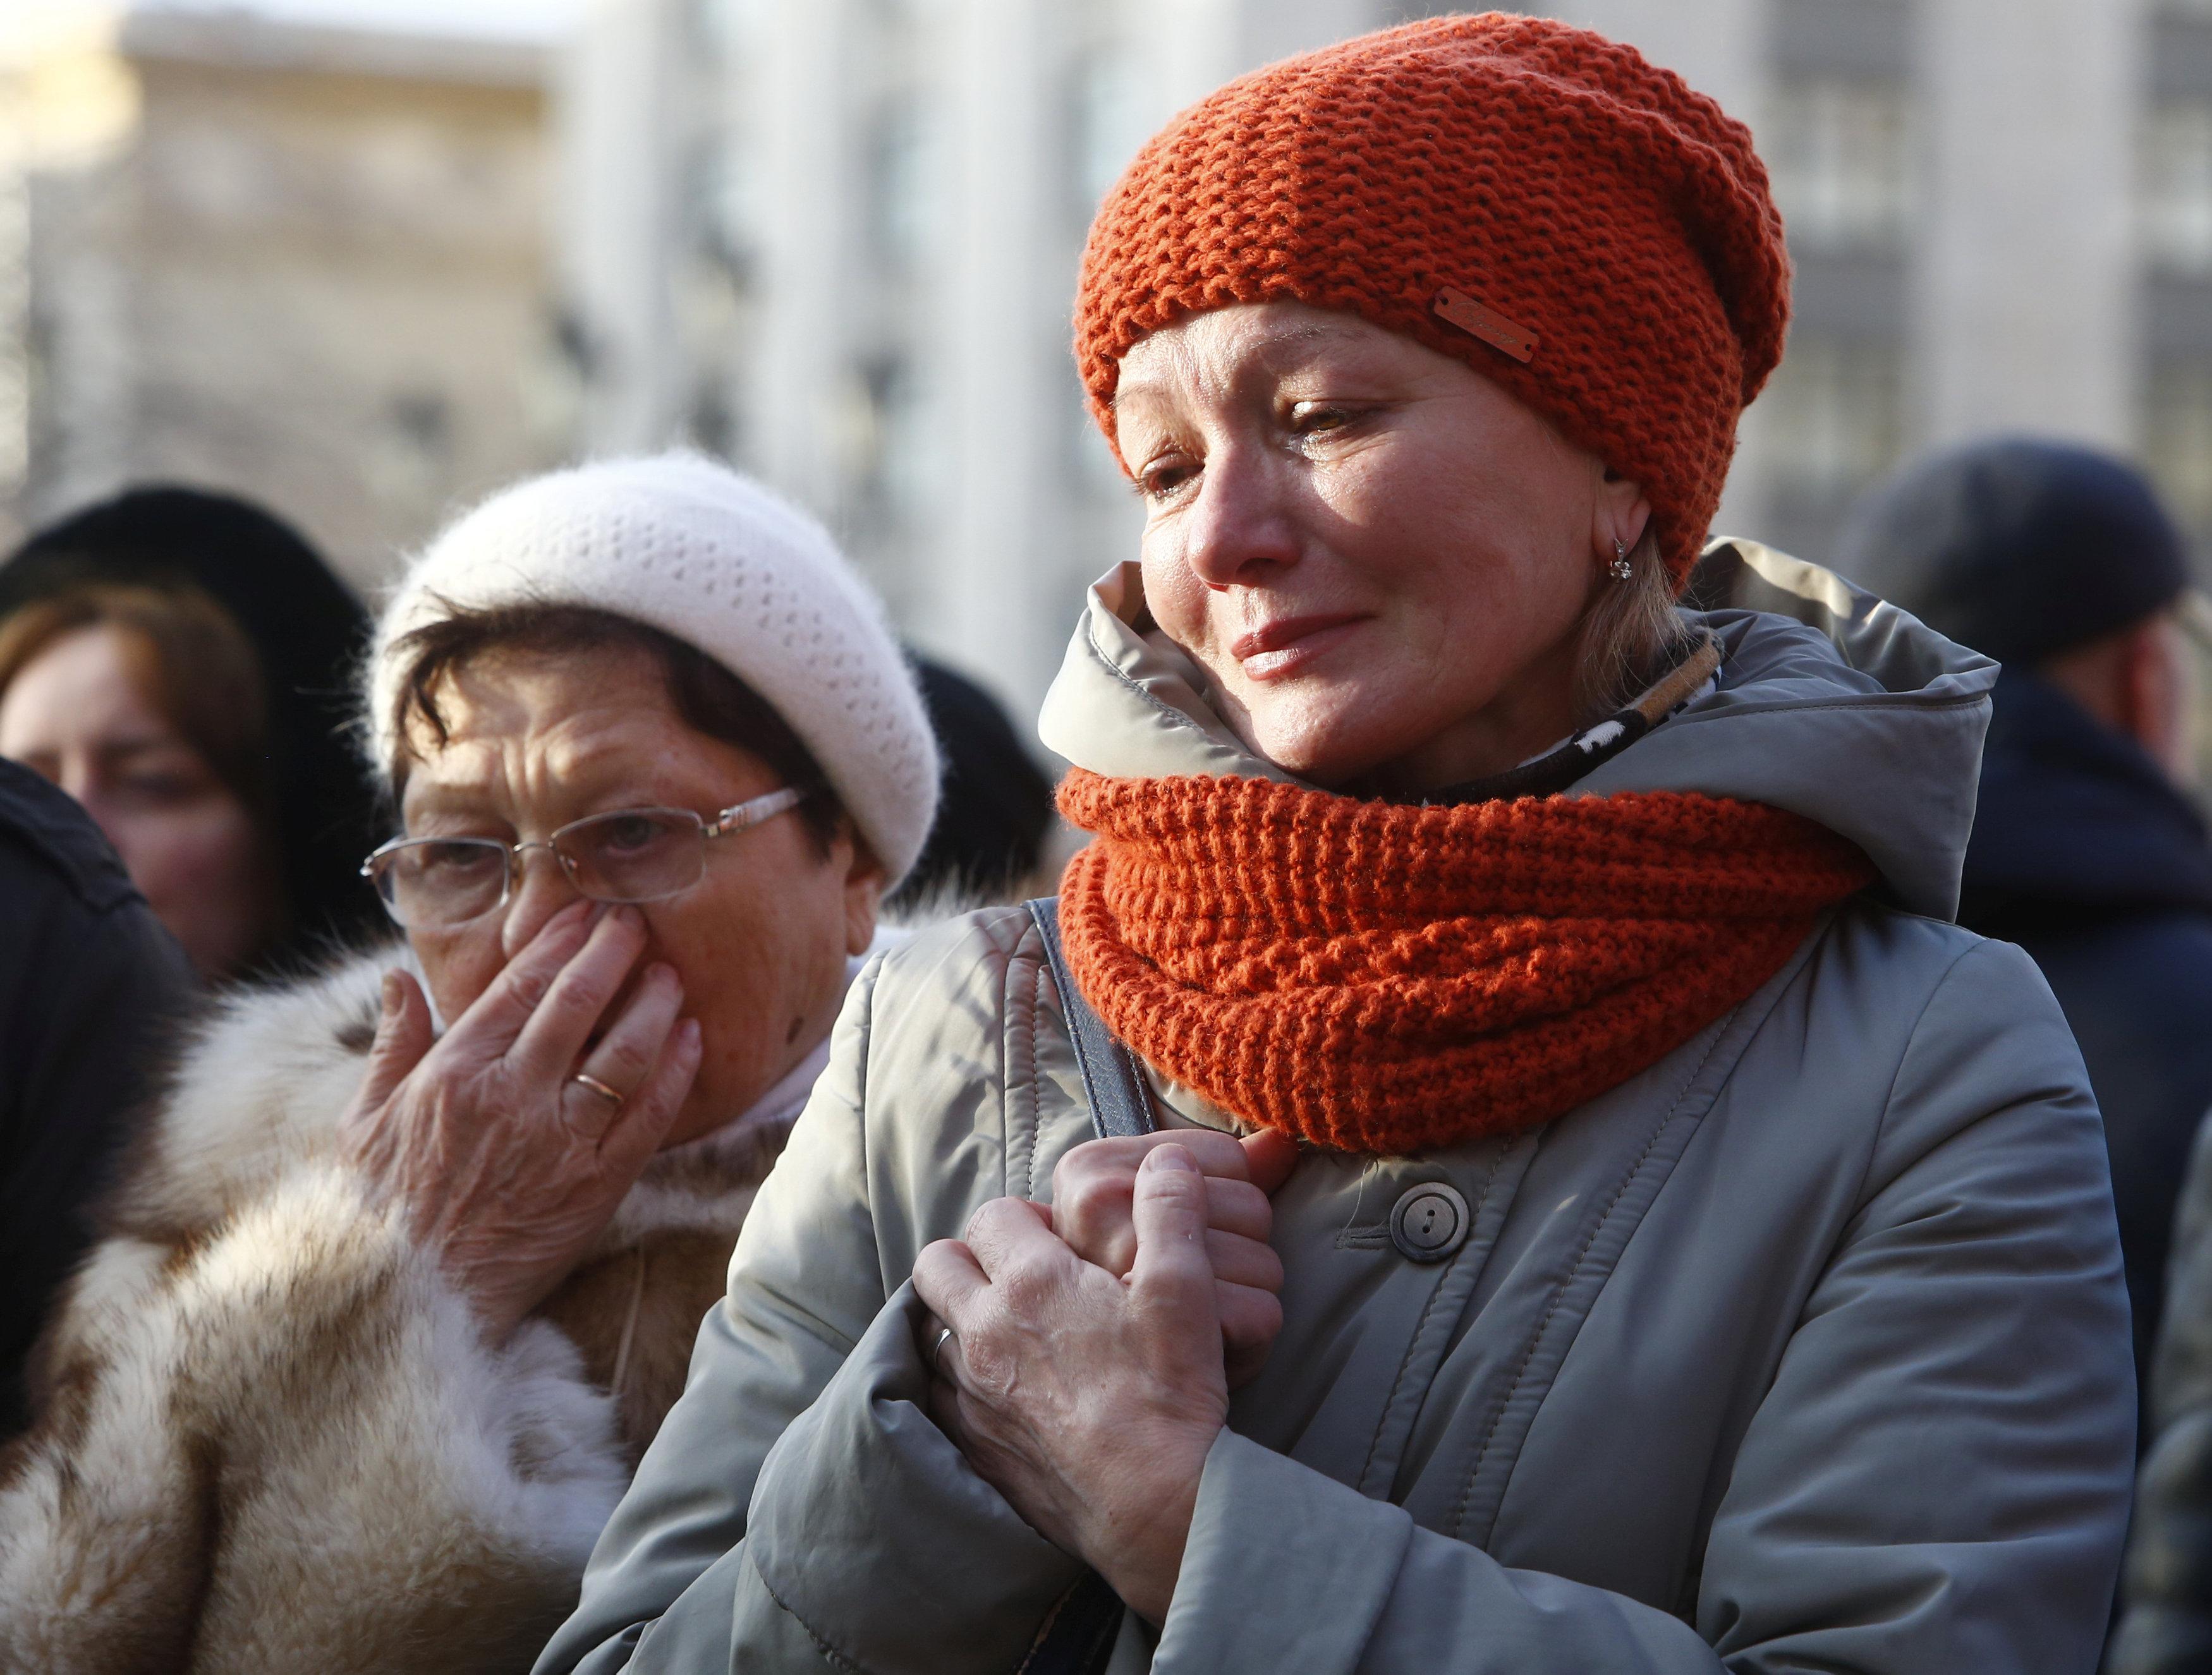 PlazaManezhnayaen Moscú(REUTERS/Sergei Karpukhin)